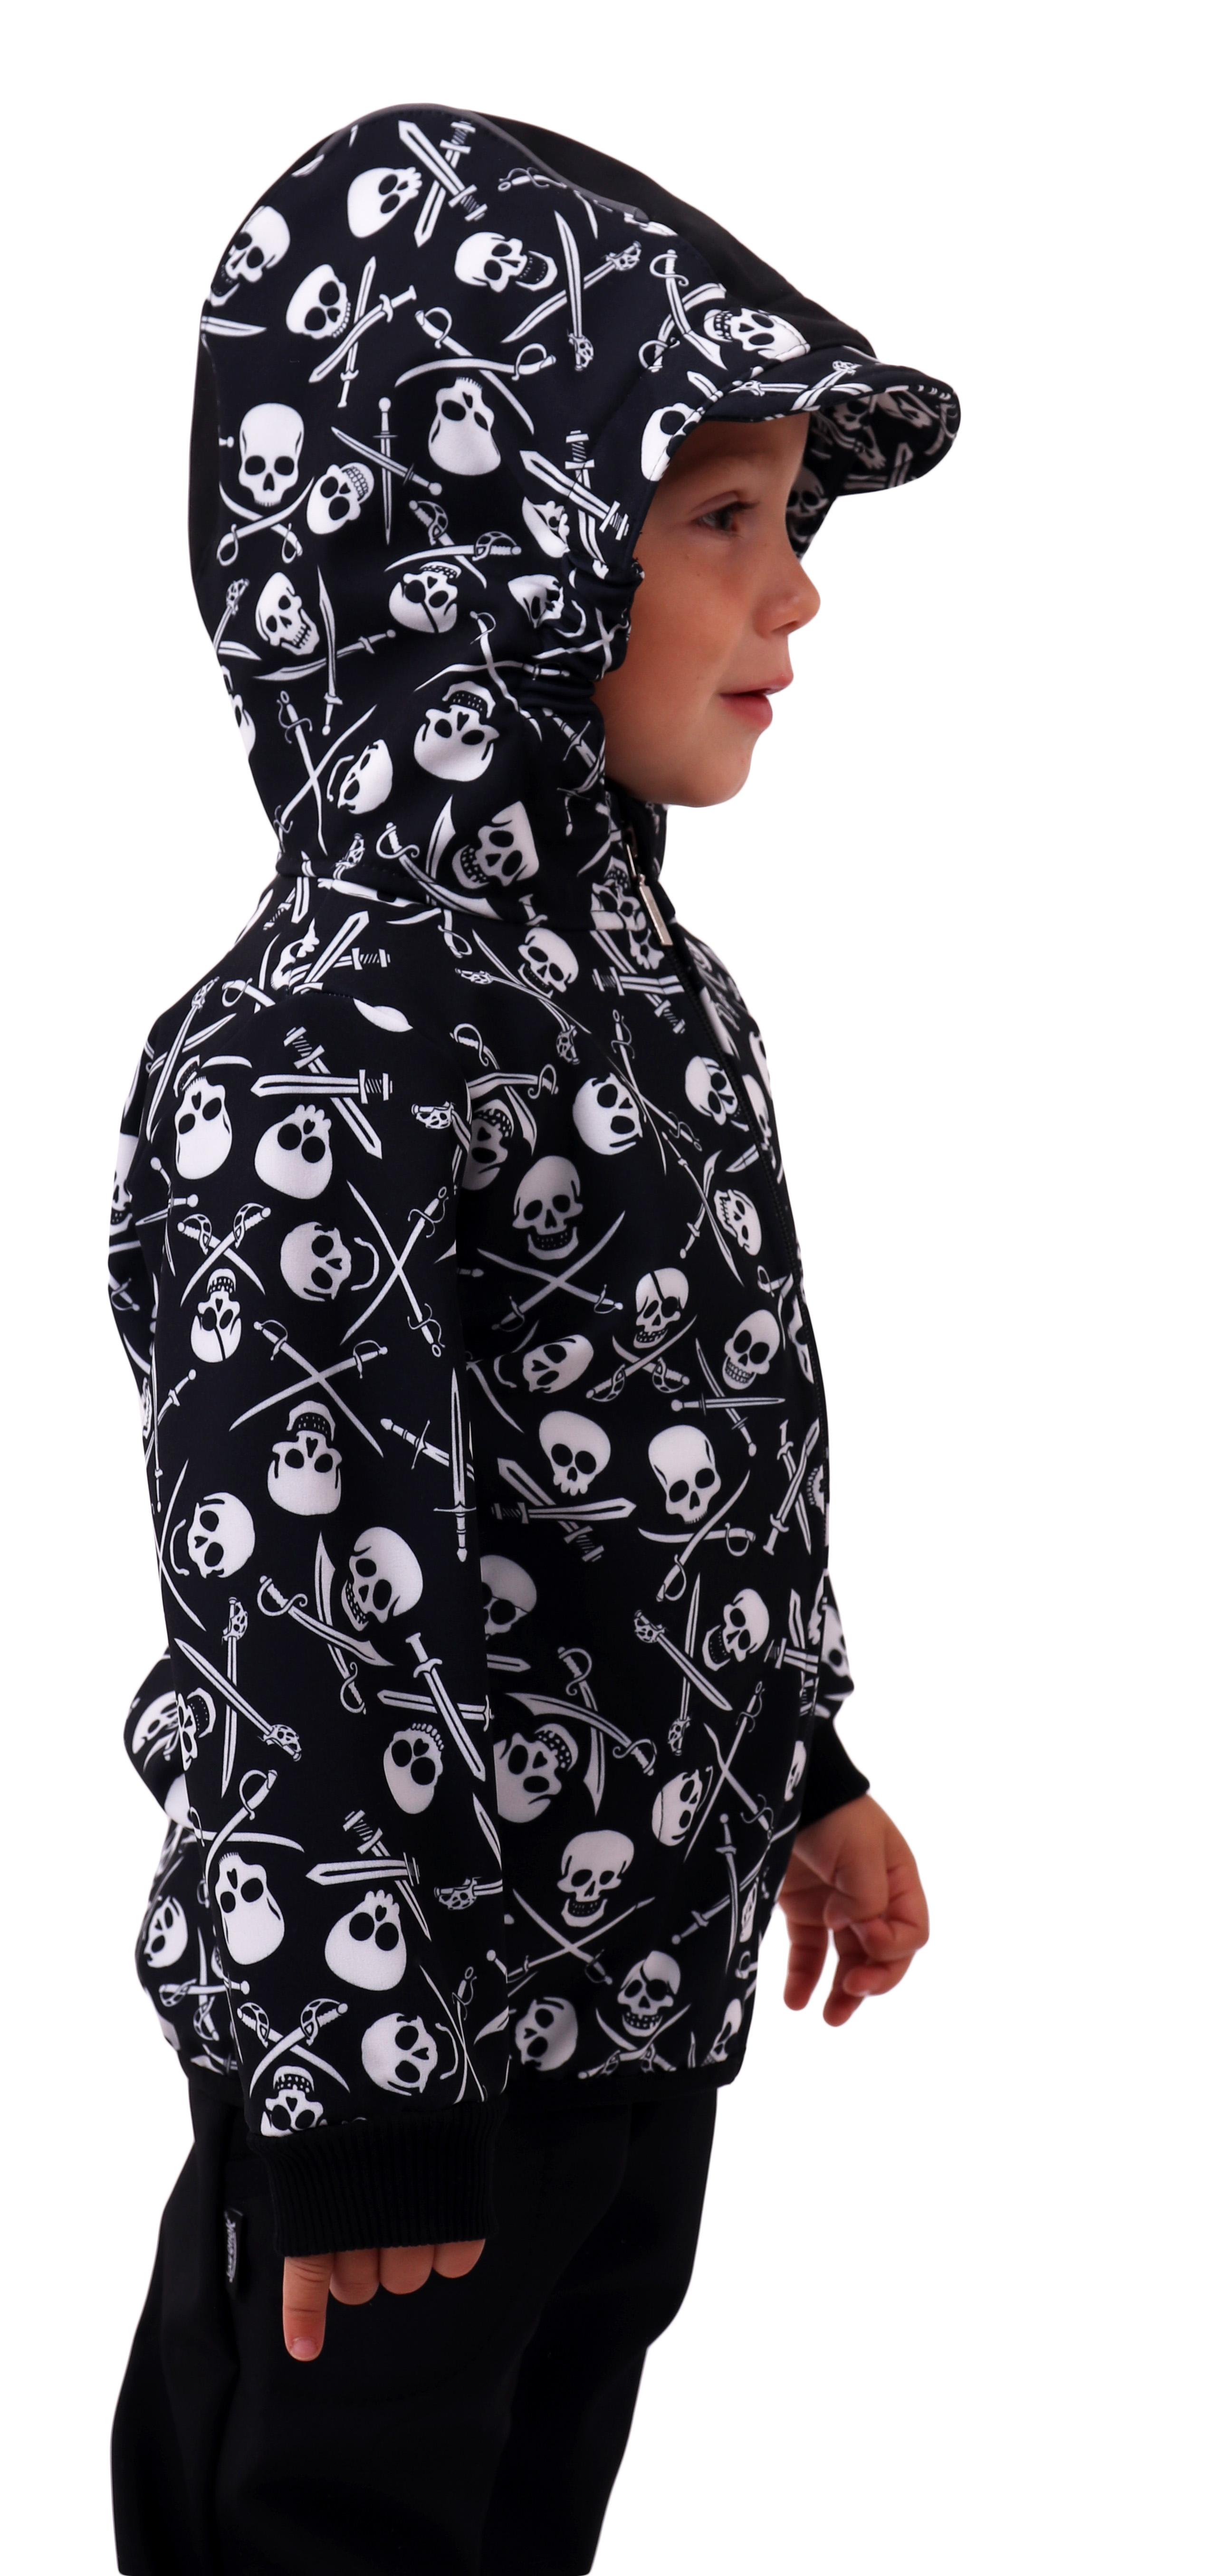 Dětská softshellová bunda, pirátské lebky, 80